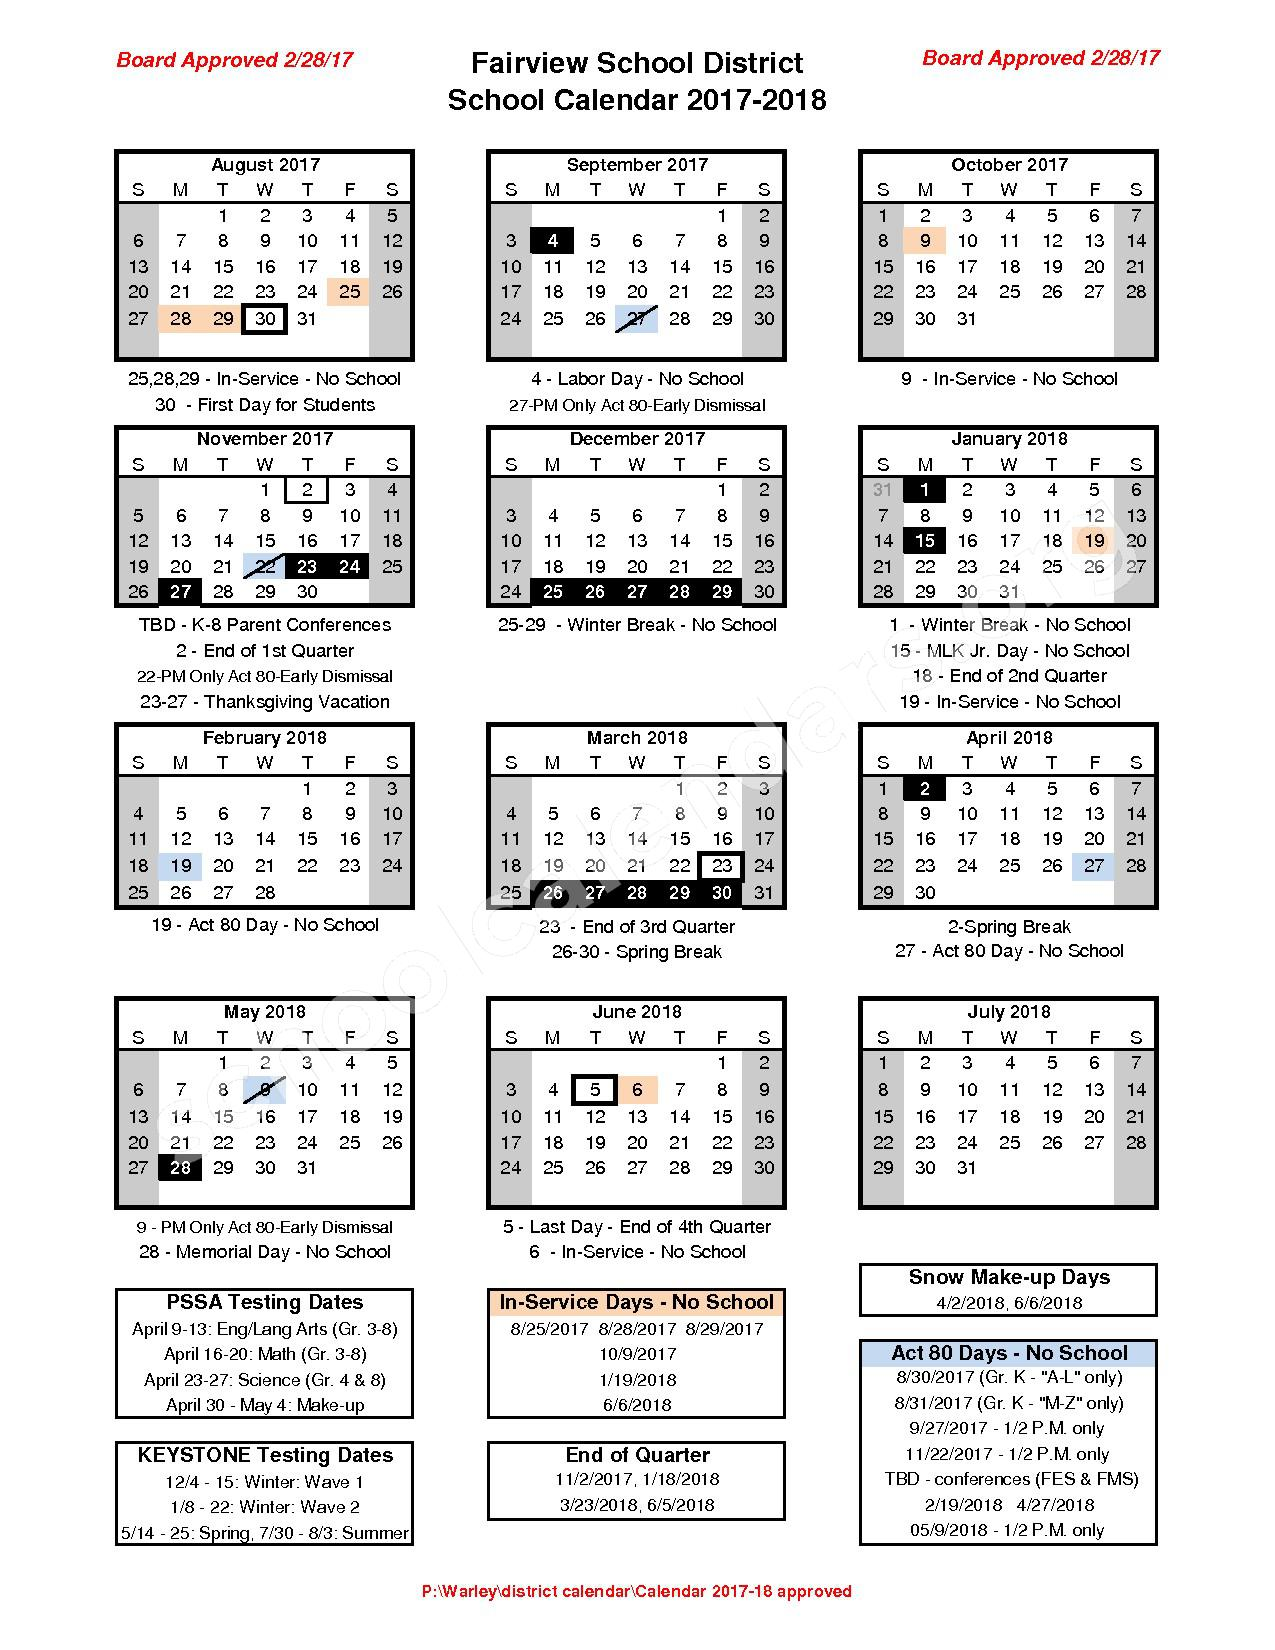 2017 - 2018 School Calendar – Fairview School District – page 1